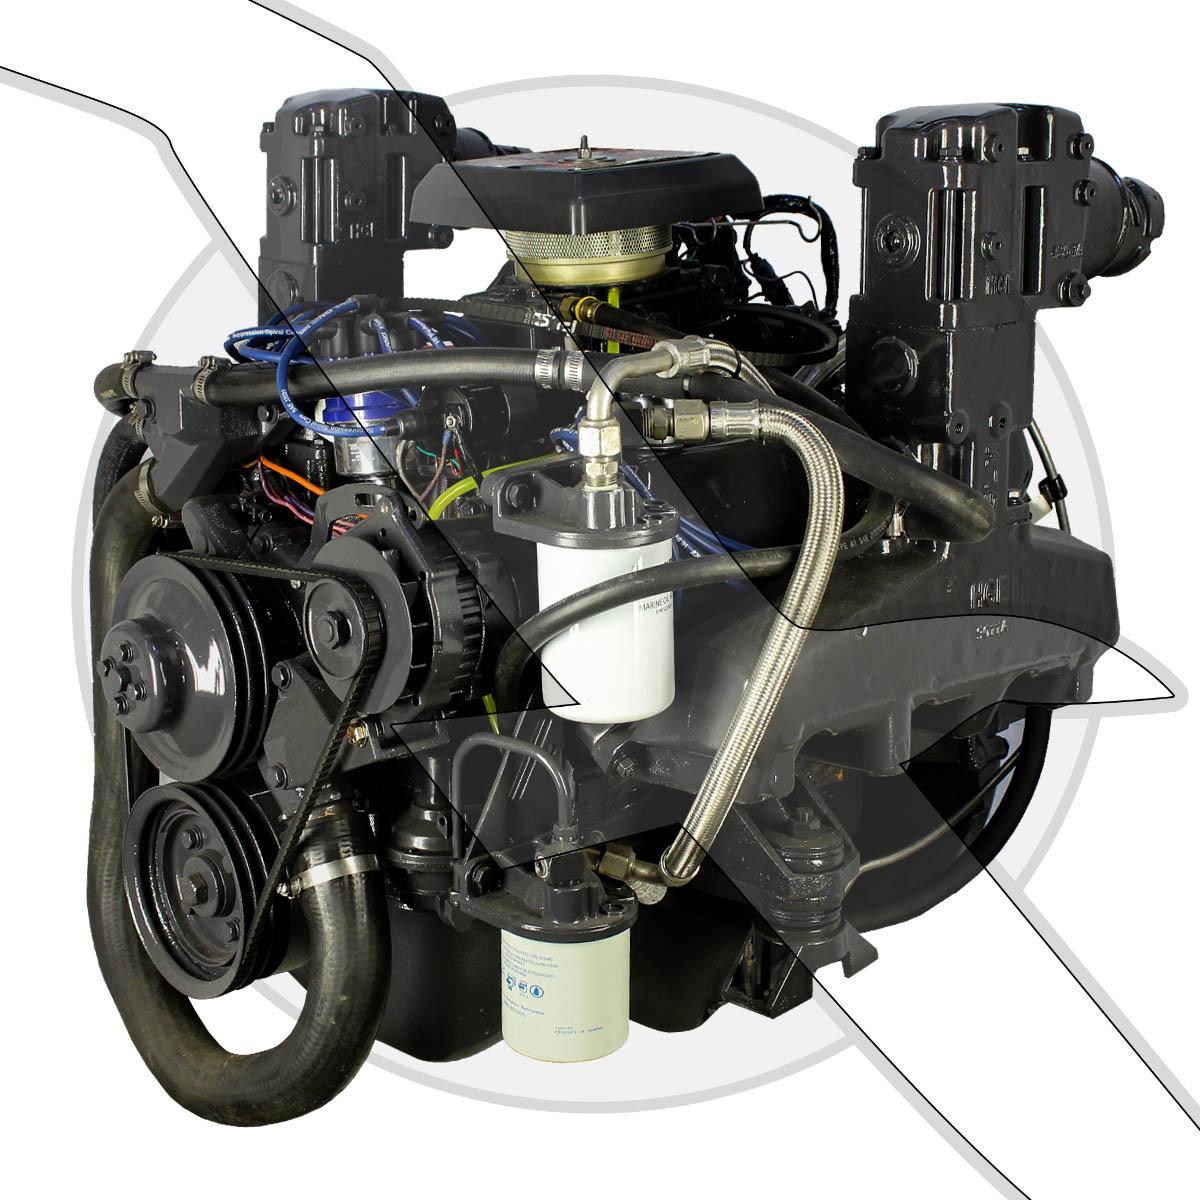 7 5l 460ci omc king cobra engine complete marine motor 7 5